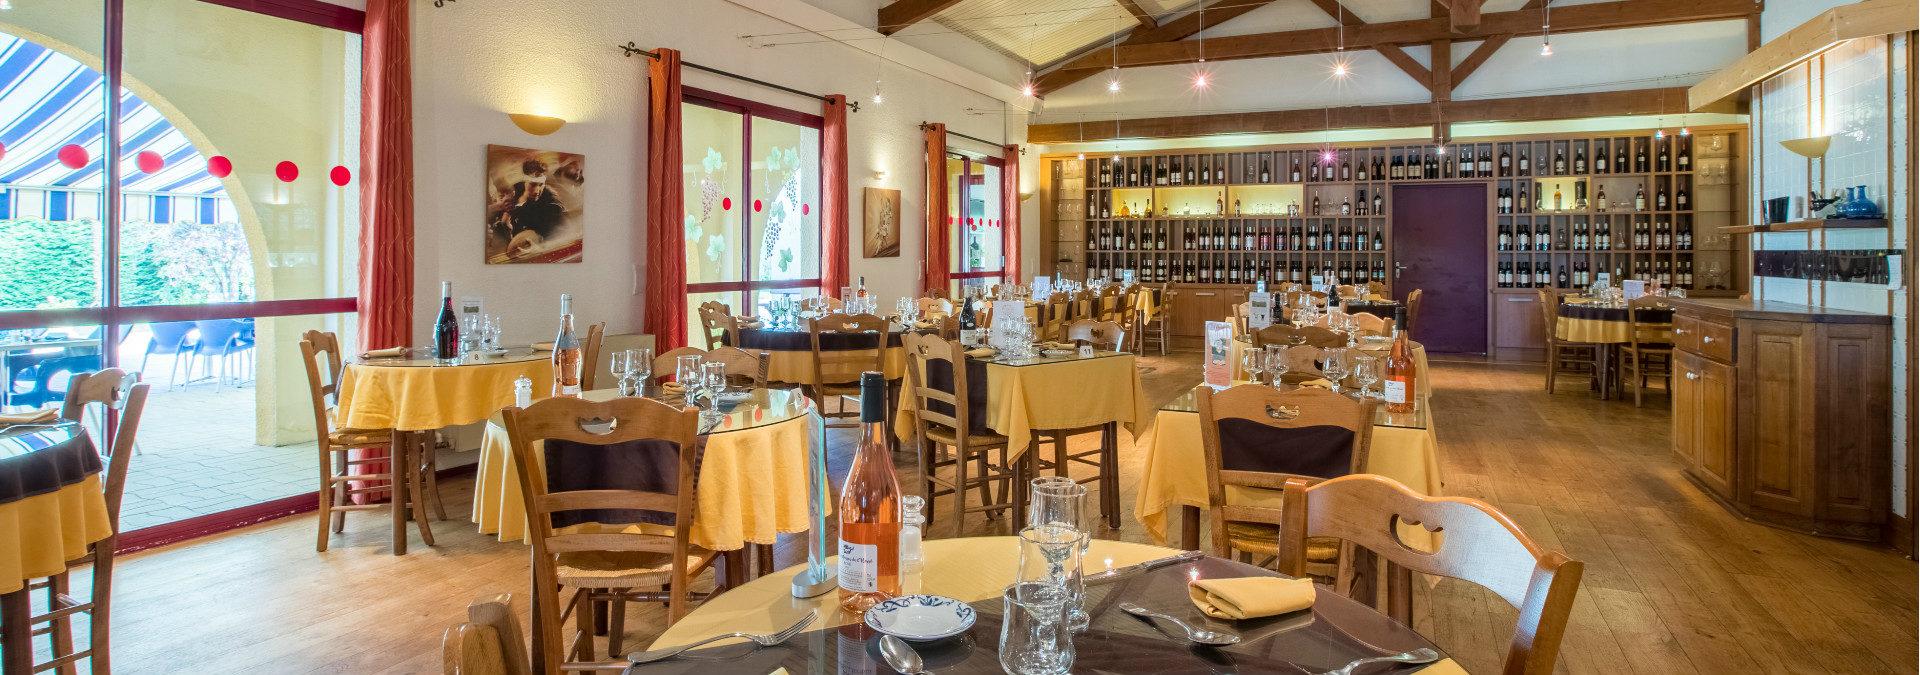 Hôtel*** Restaurant Solenca